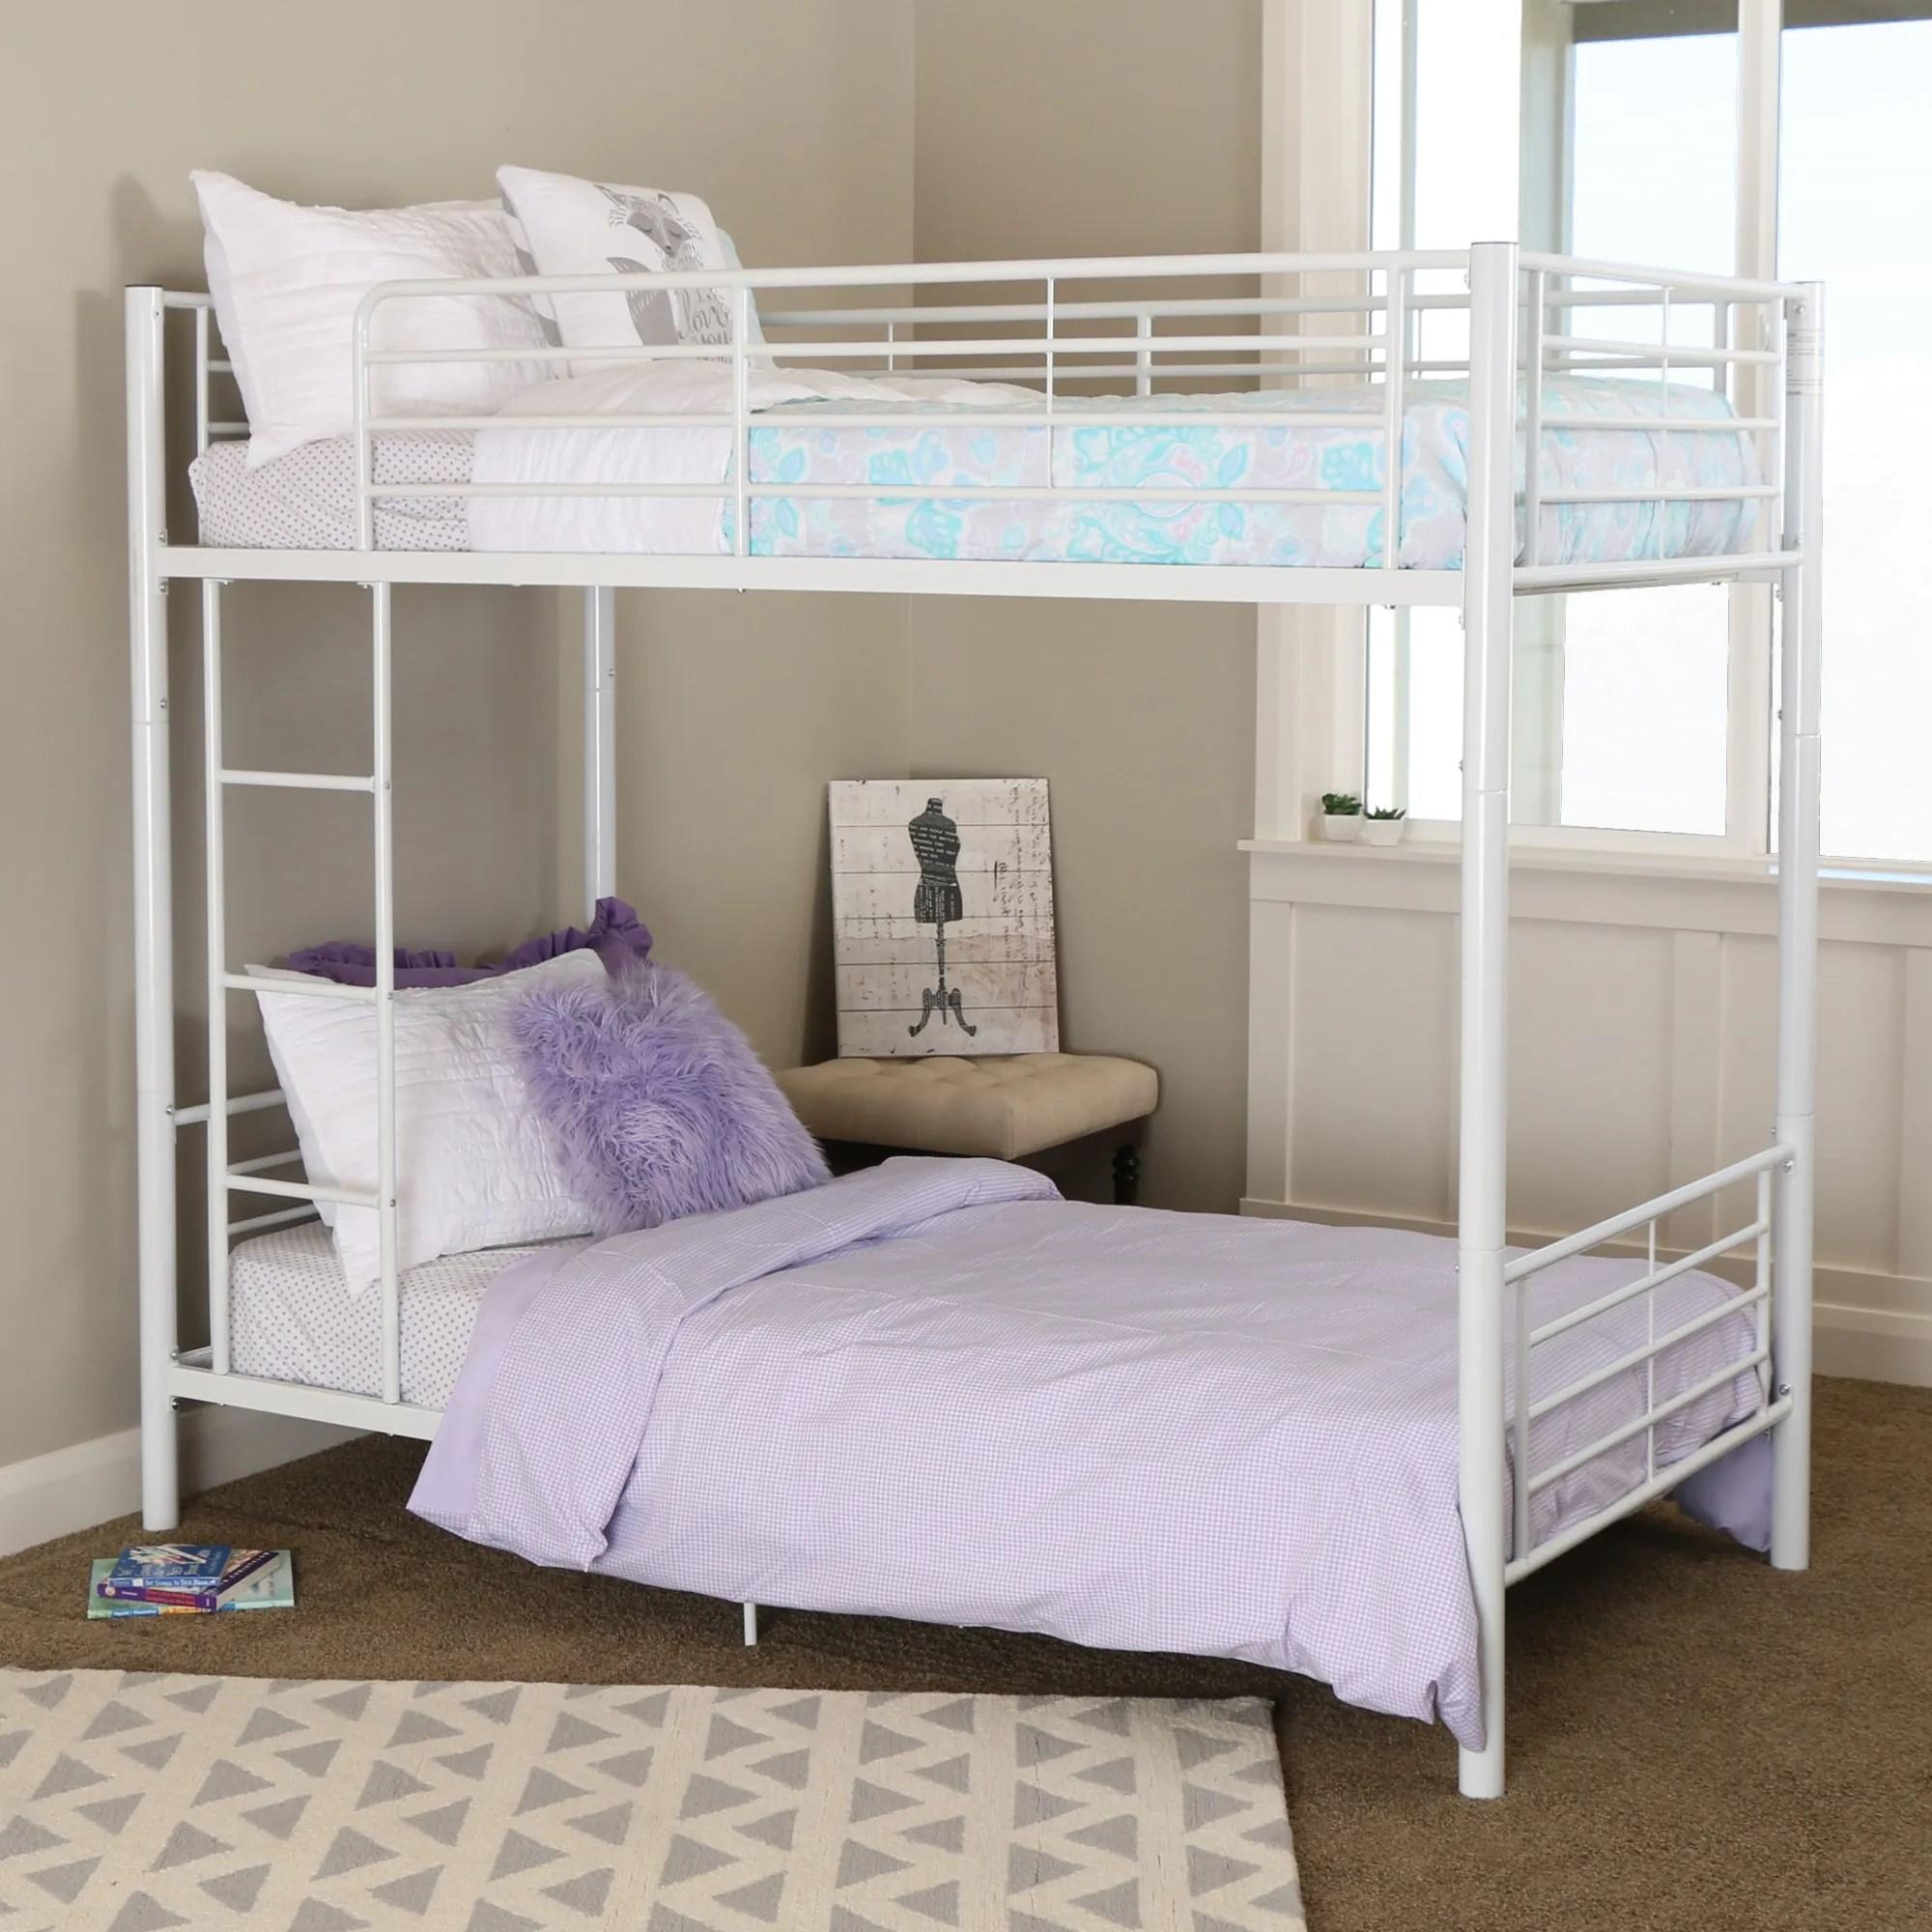 Grand Metal Twin Over Twin Bunk Bed Metal Bunk Beds Ark Metal Bunk Beds That Separate houzz 01 Metal Bunk Beds